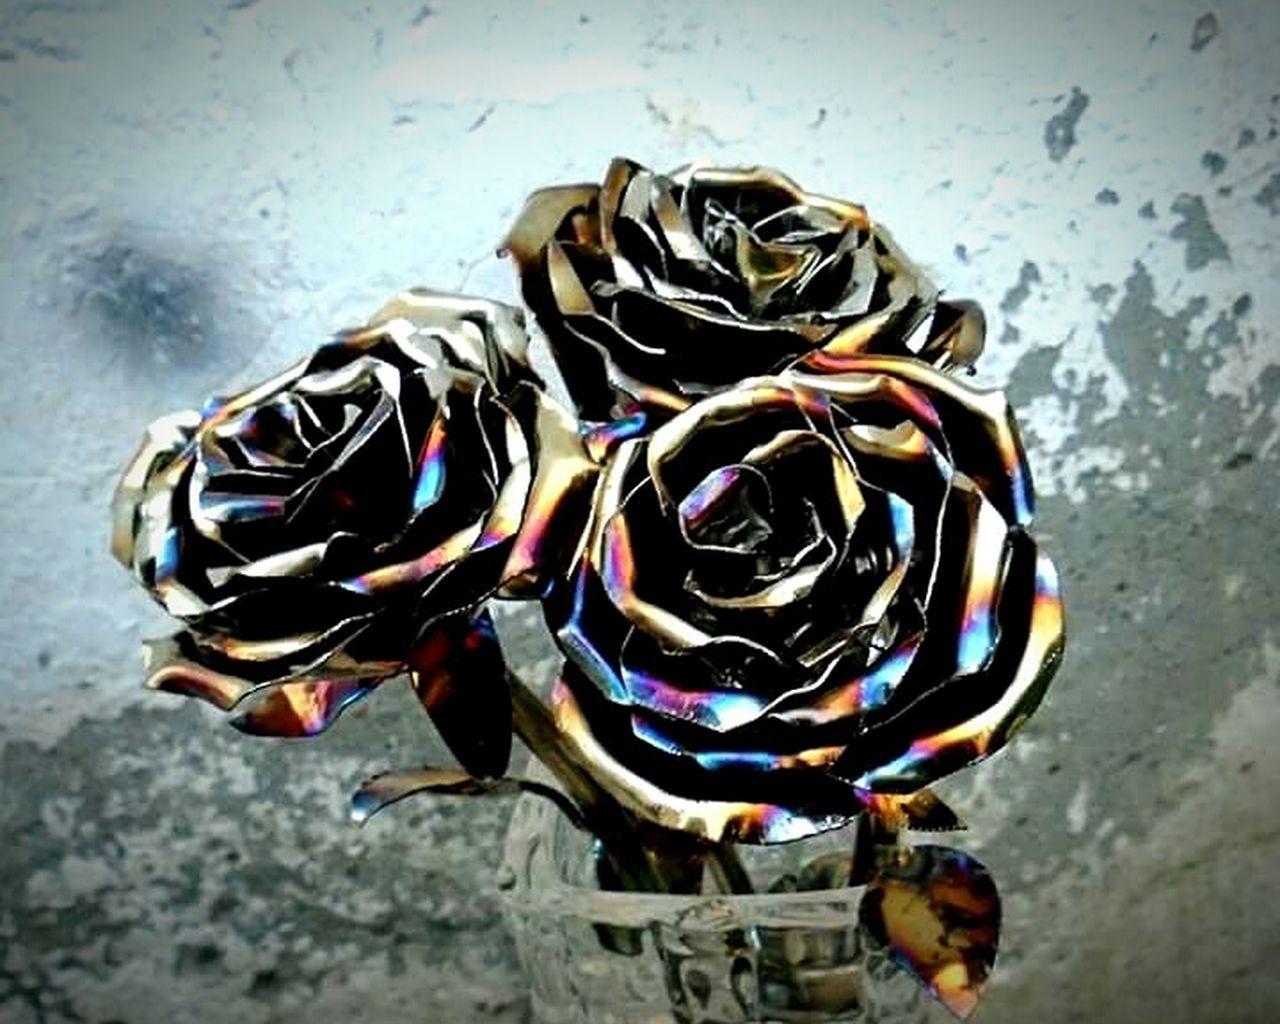 Handmade Metal Roses. Stainless Steel facebook.com/handmadesteelrosesOutdoors Close-up No People Day First Eyeem Photo Handmade By Me Art And Craft Art Rose🌹 Garden EyeEmNewHere